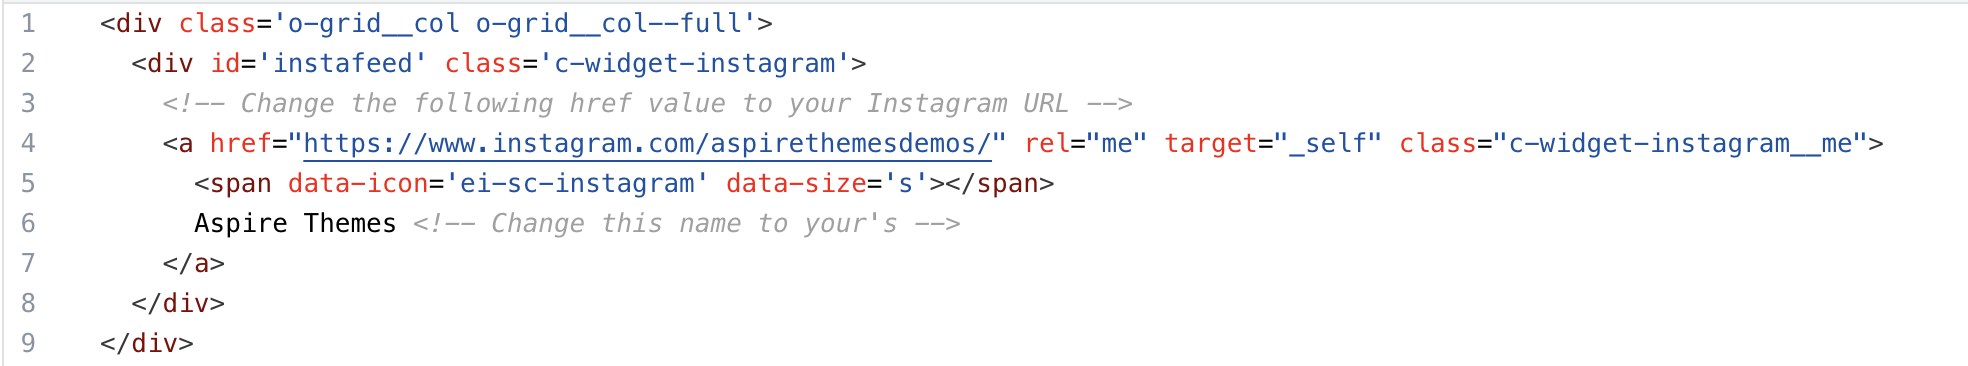 Instagram Partials Code